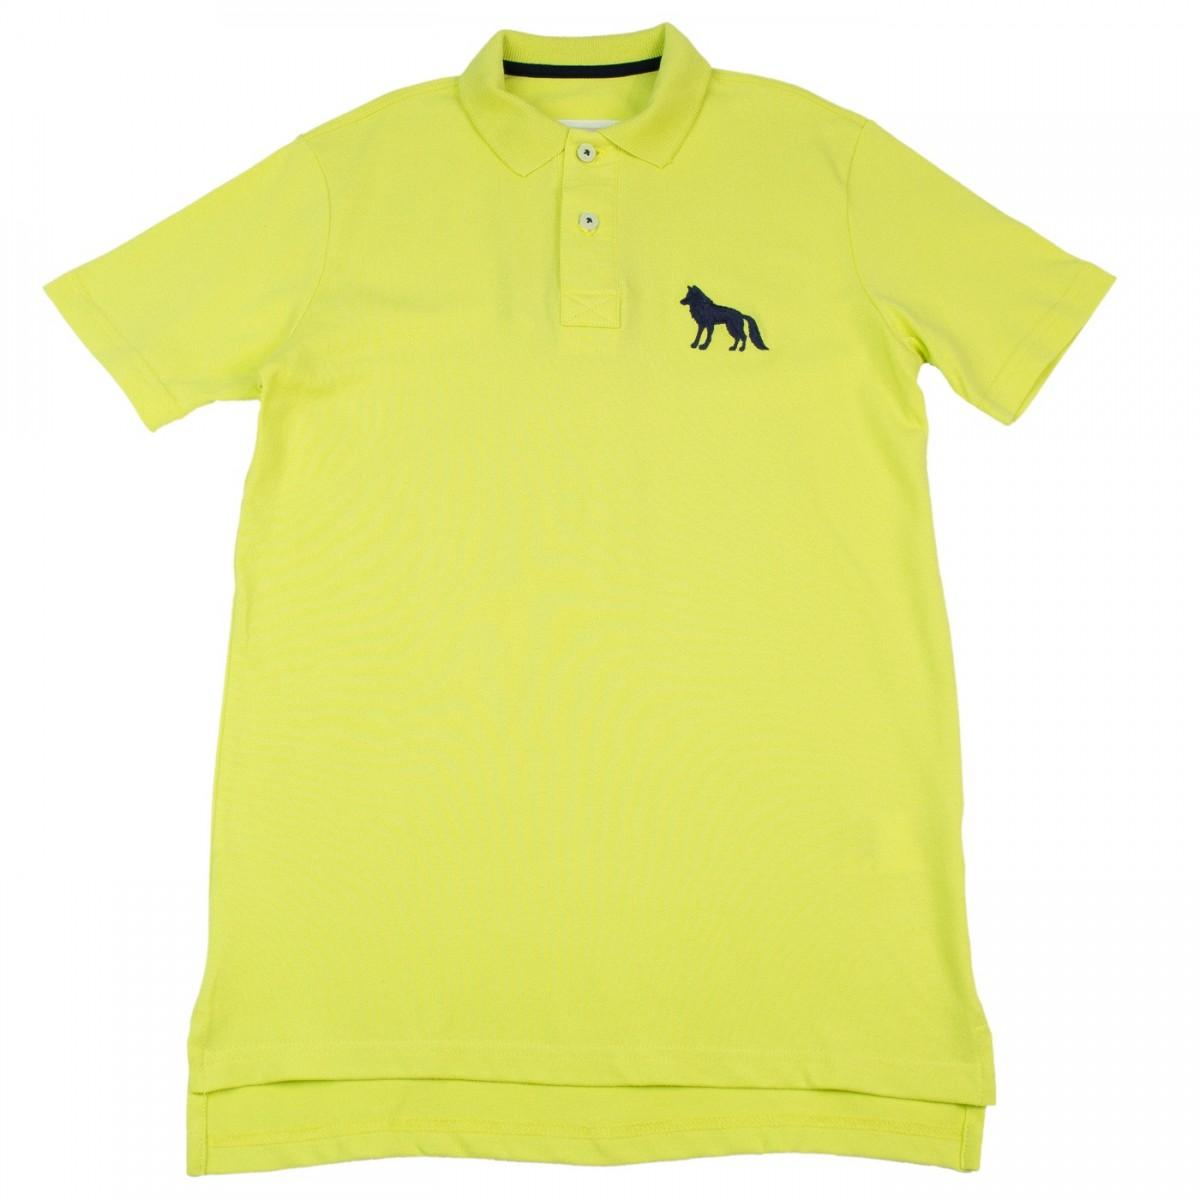 5fe28111f2e61 Bizz Store - Camisa Polo Infantil Masculina Acostamento Royal